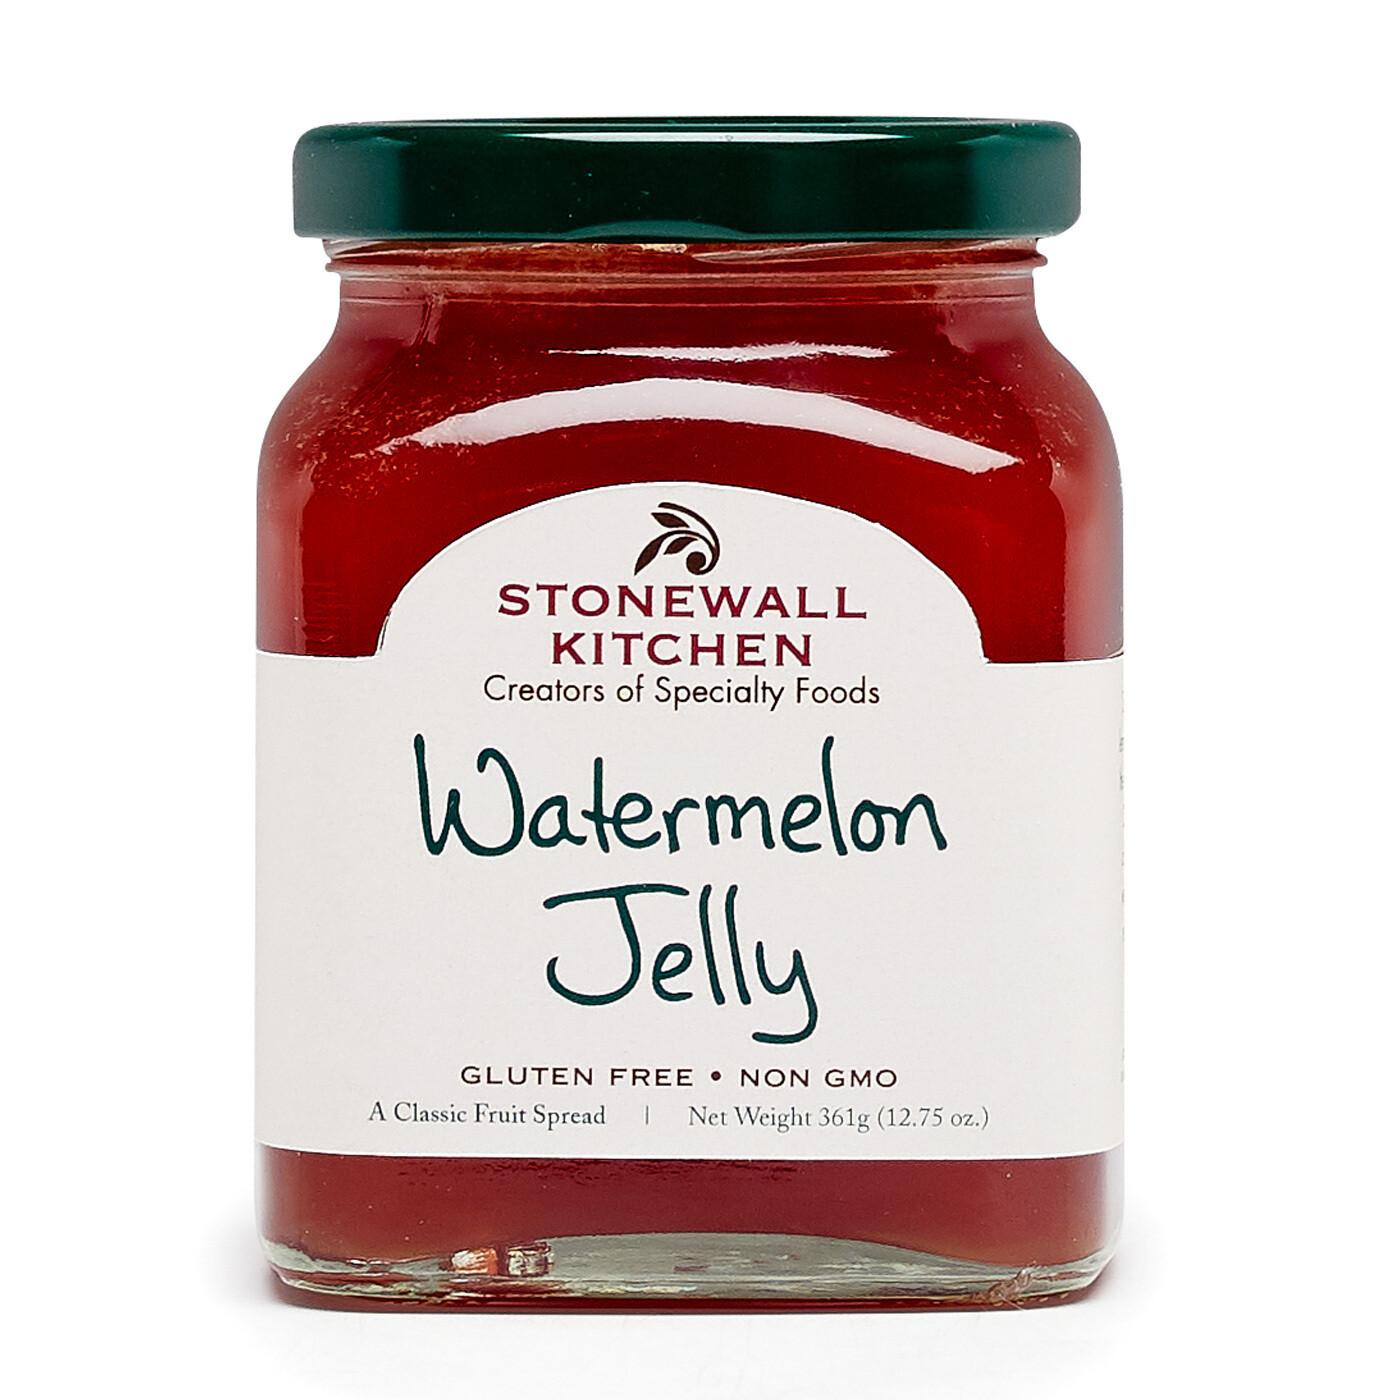 Watermelon jelly